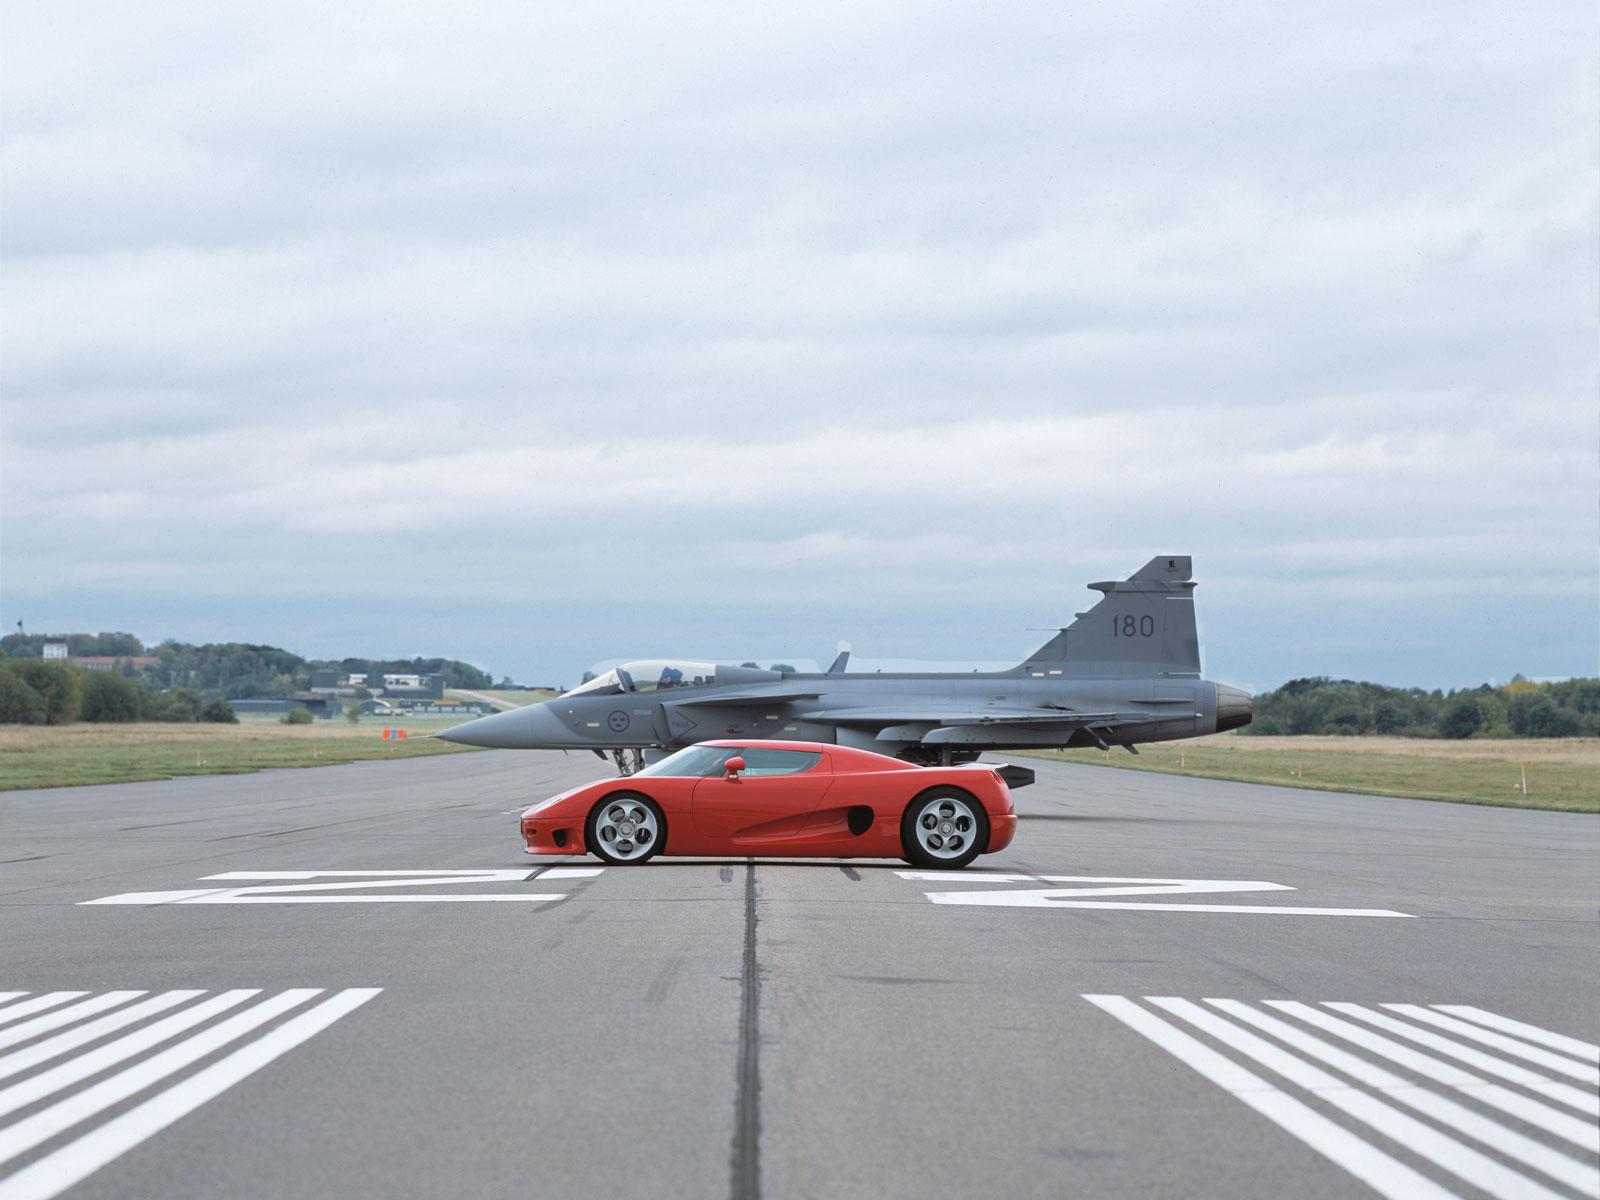 Hintergrundbilder : Fahrzeug, Flugzeug, Militärflugzeug, Koenigsegg ...